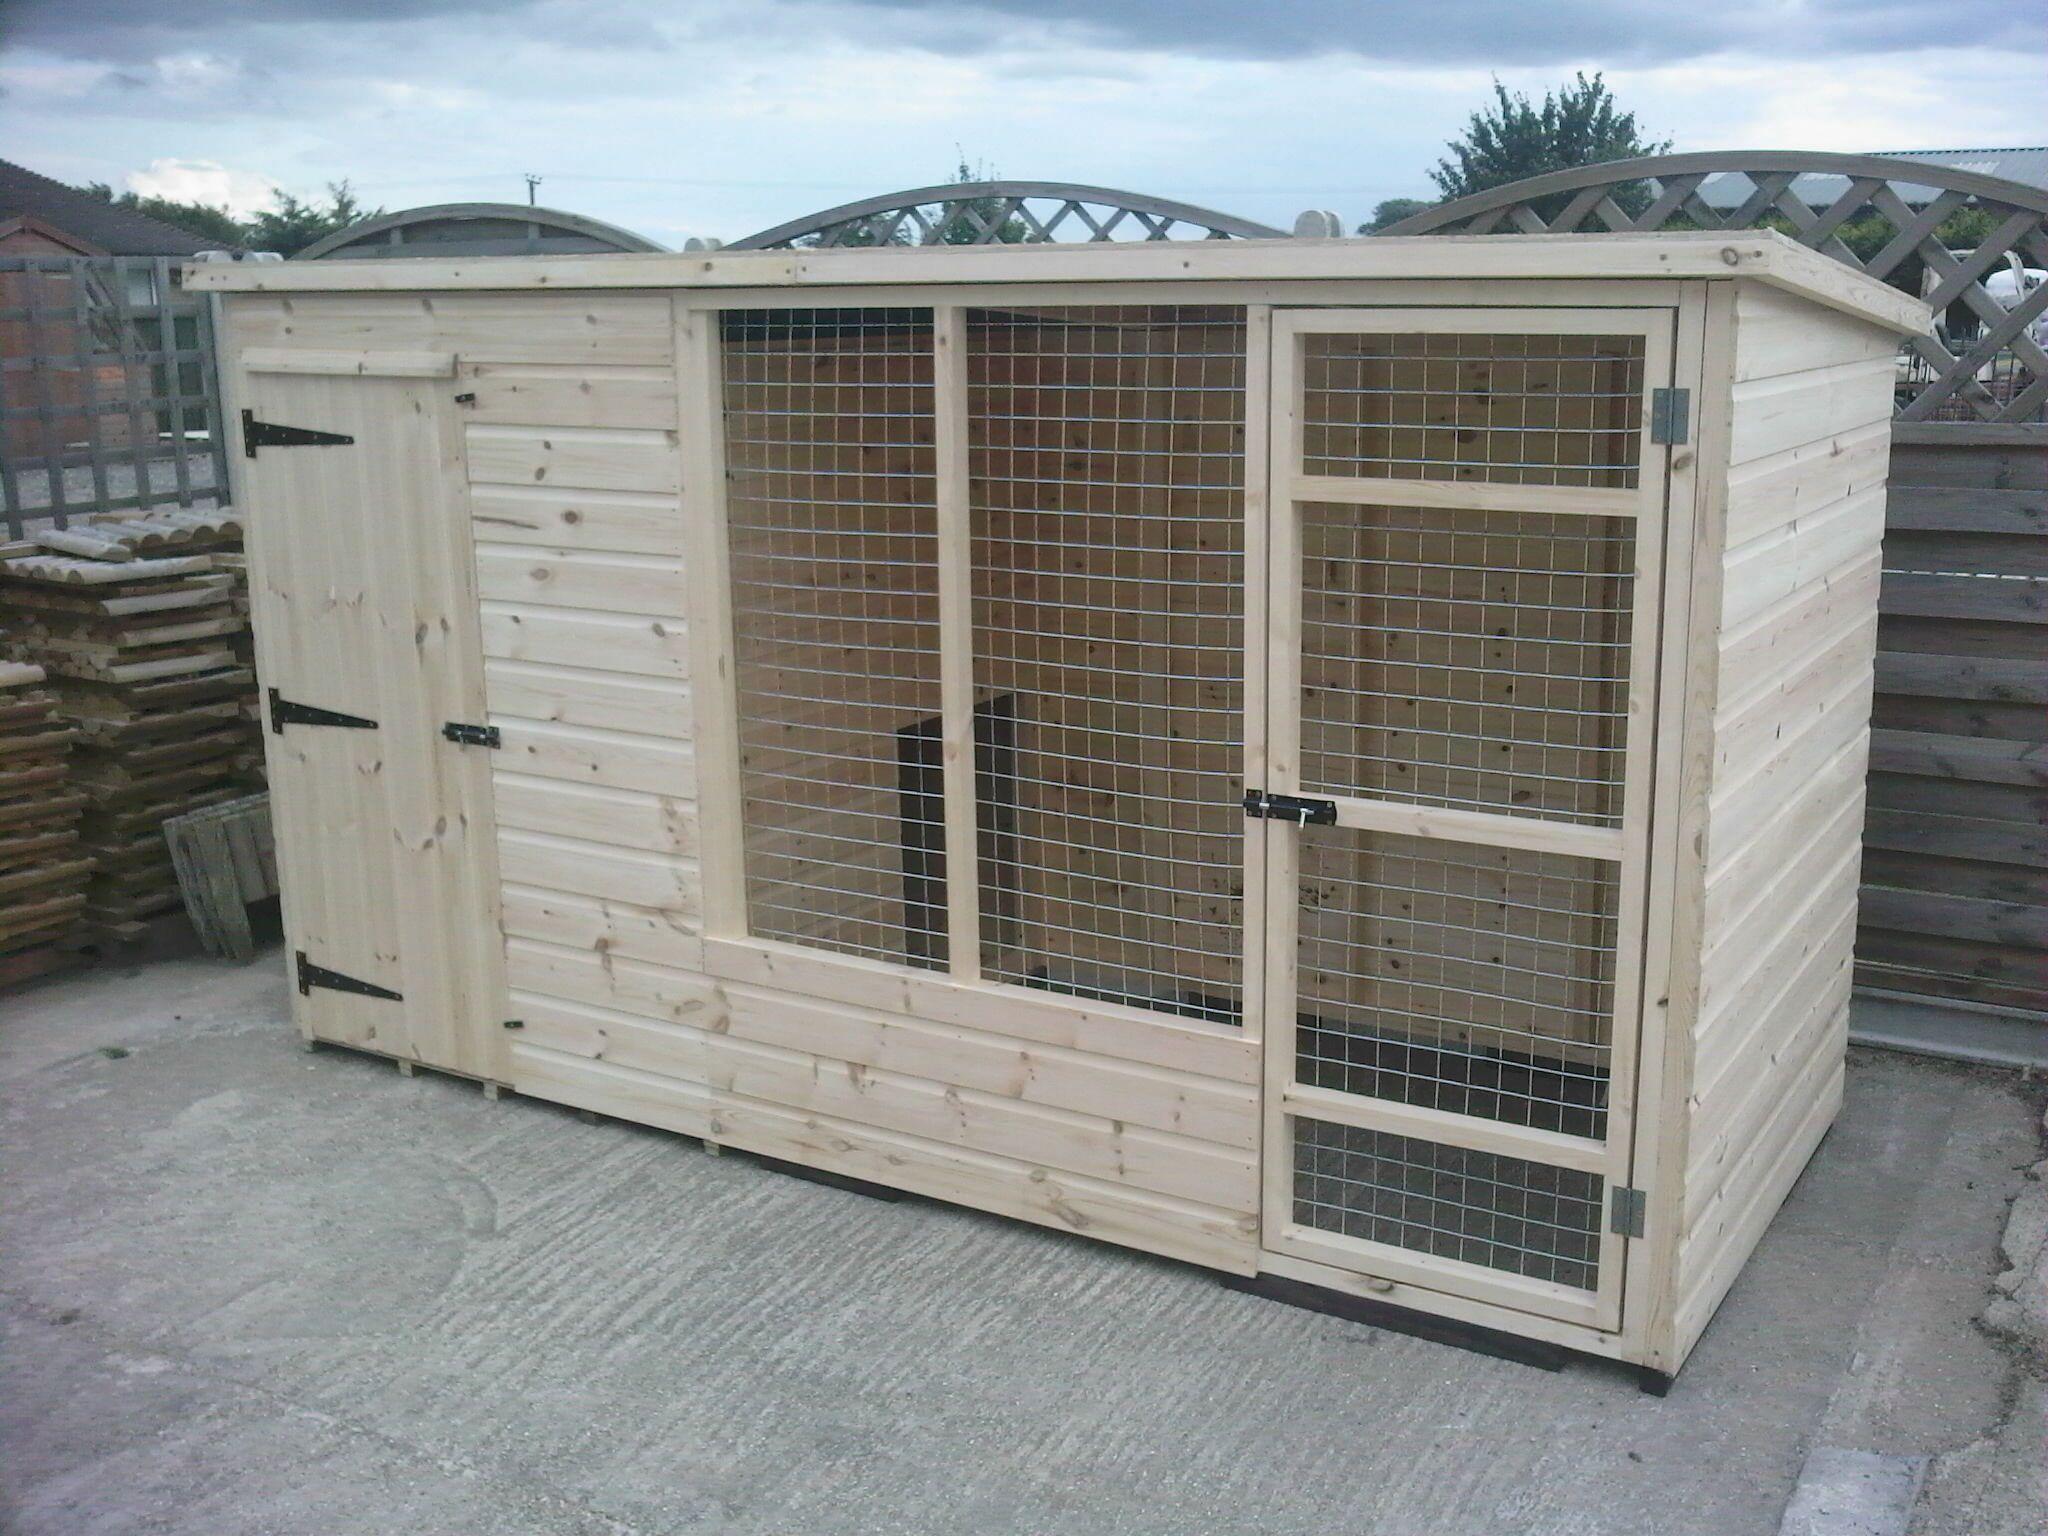 Cheap Outside Dog Kennels - http://pet.minarium.com/cheap-outside ...